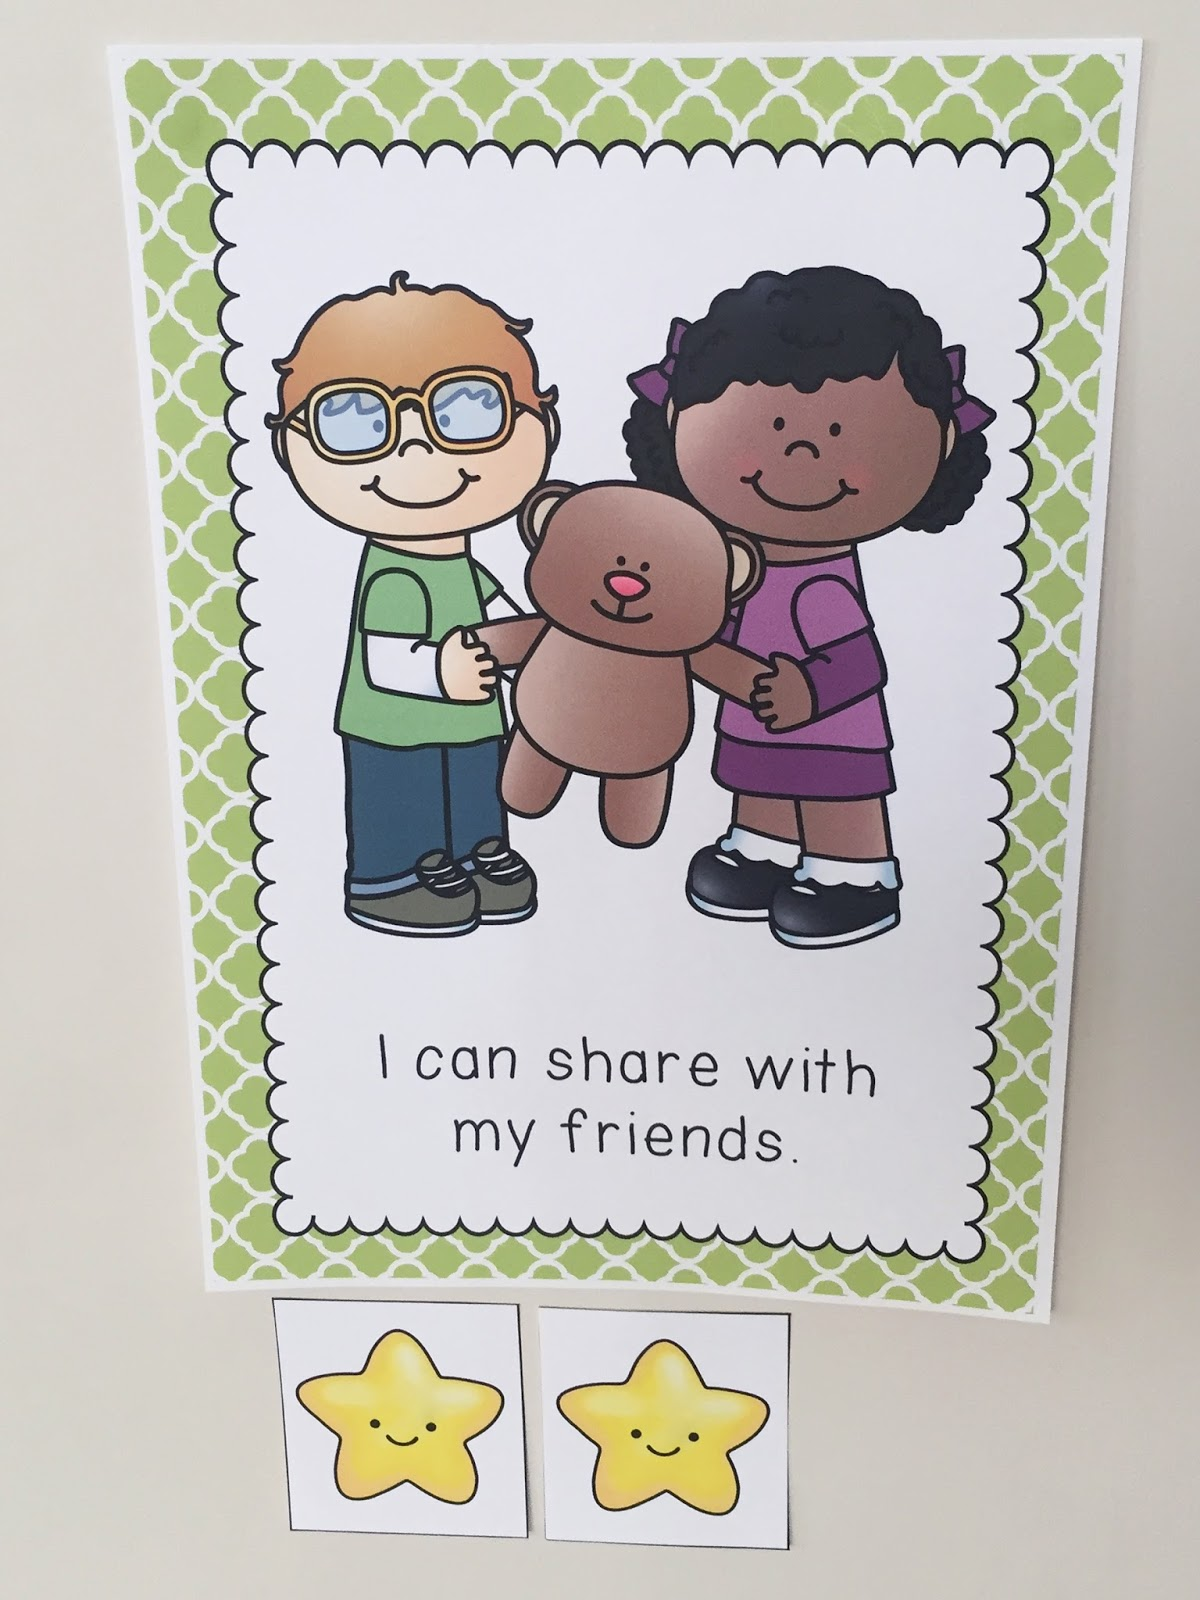 https://www.teacherspayteachers.com/Product/Habits-of-a-Happy-Class-1777074